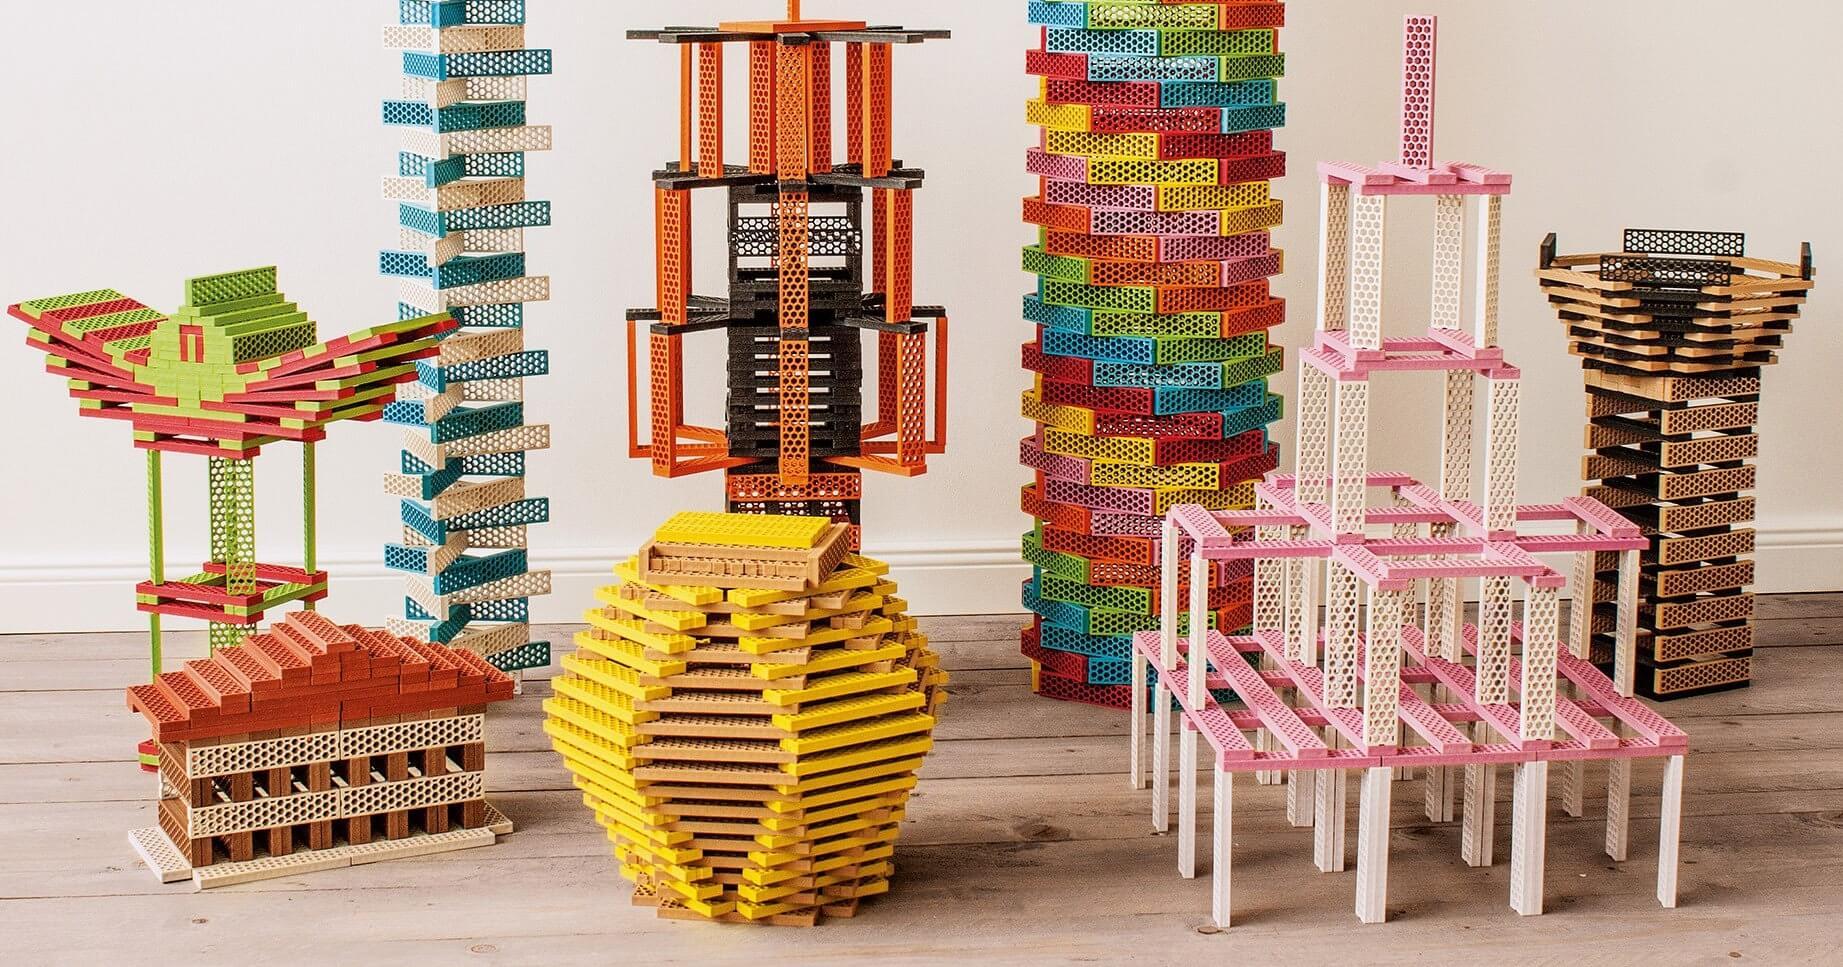 Bio Blo - Sustainable building blocks